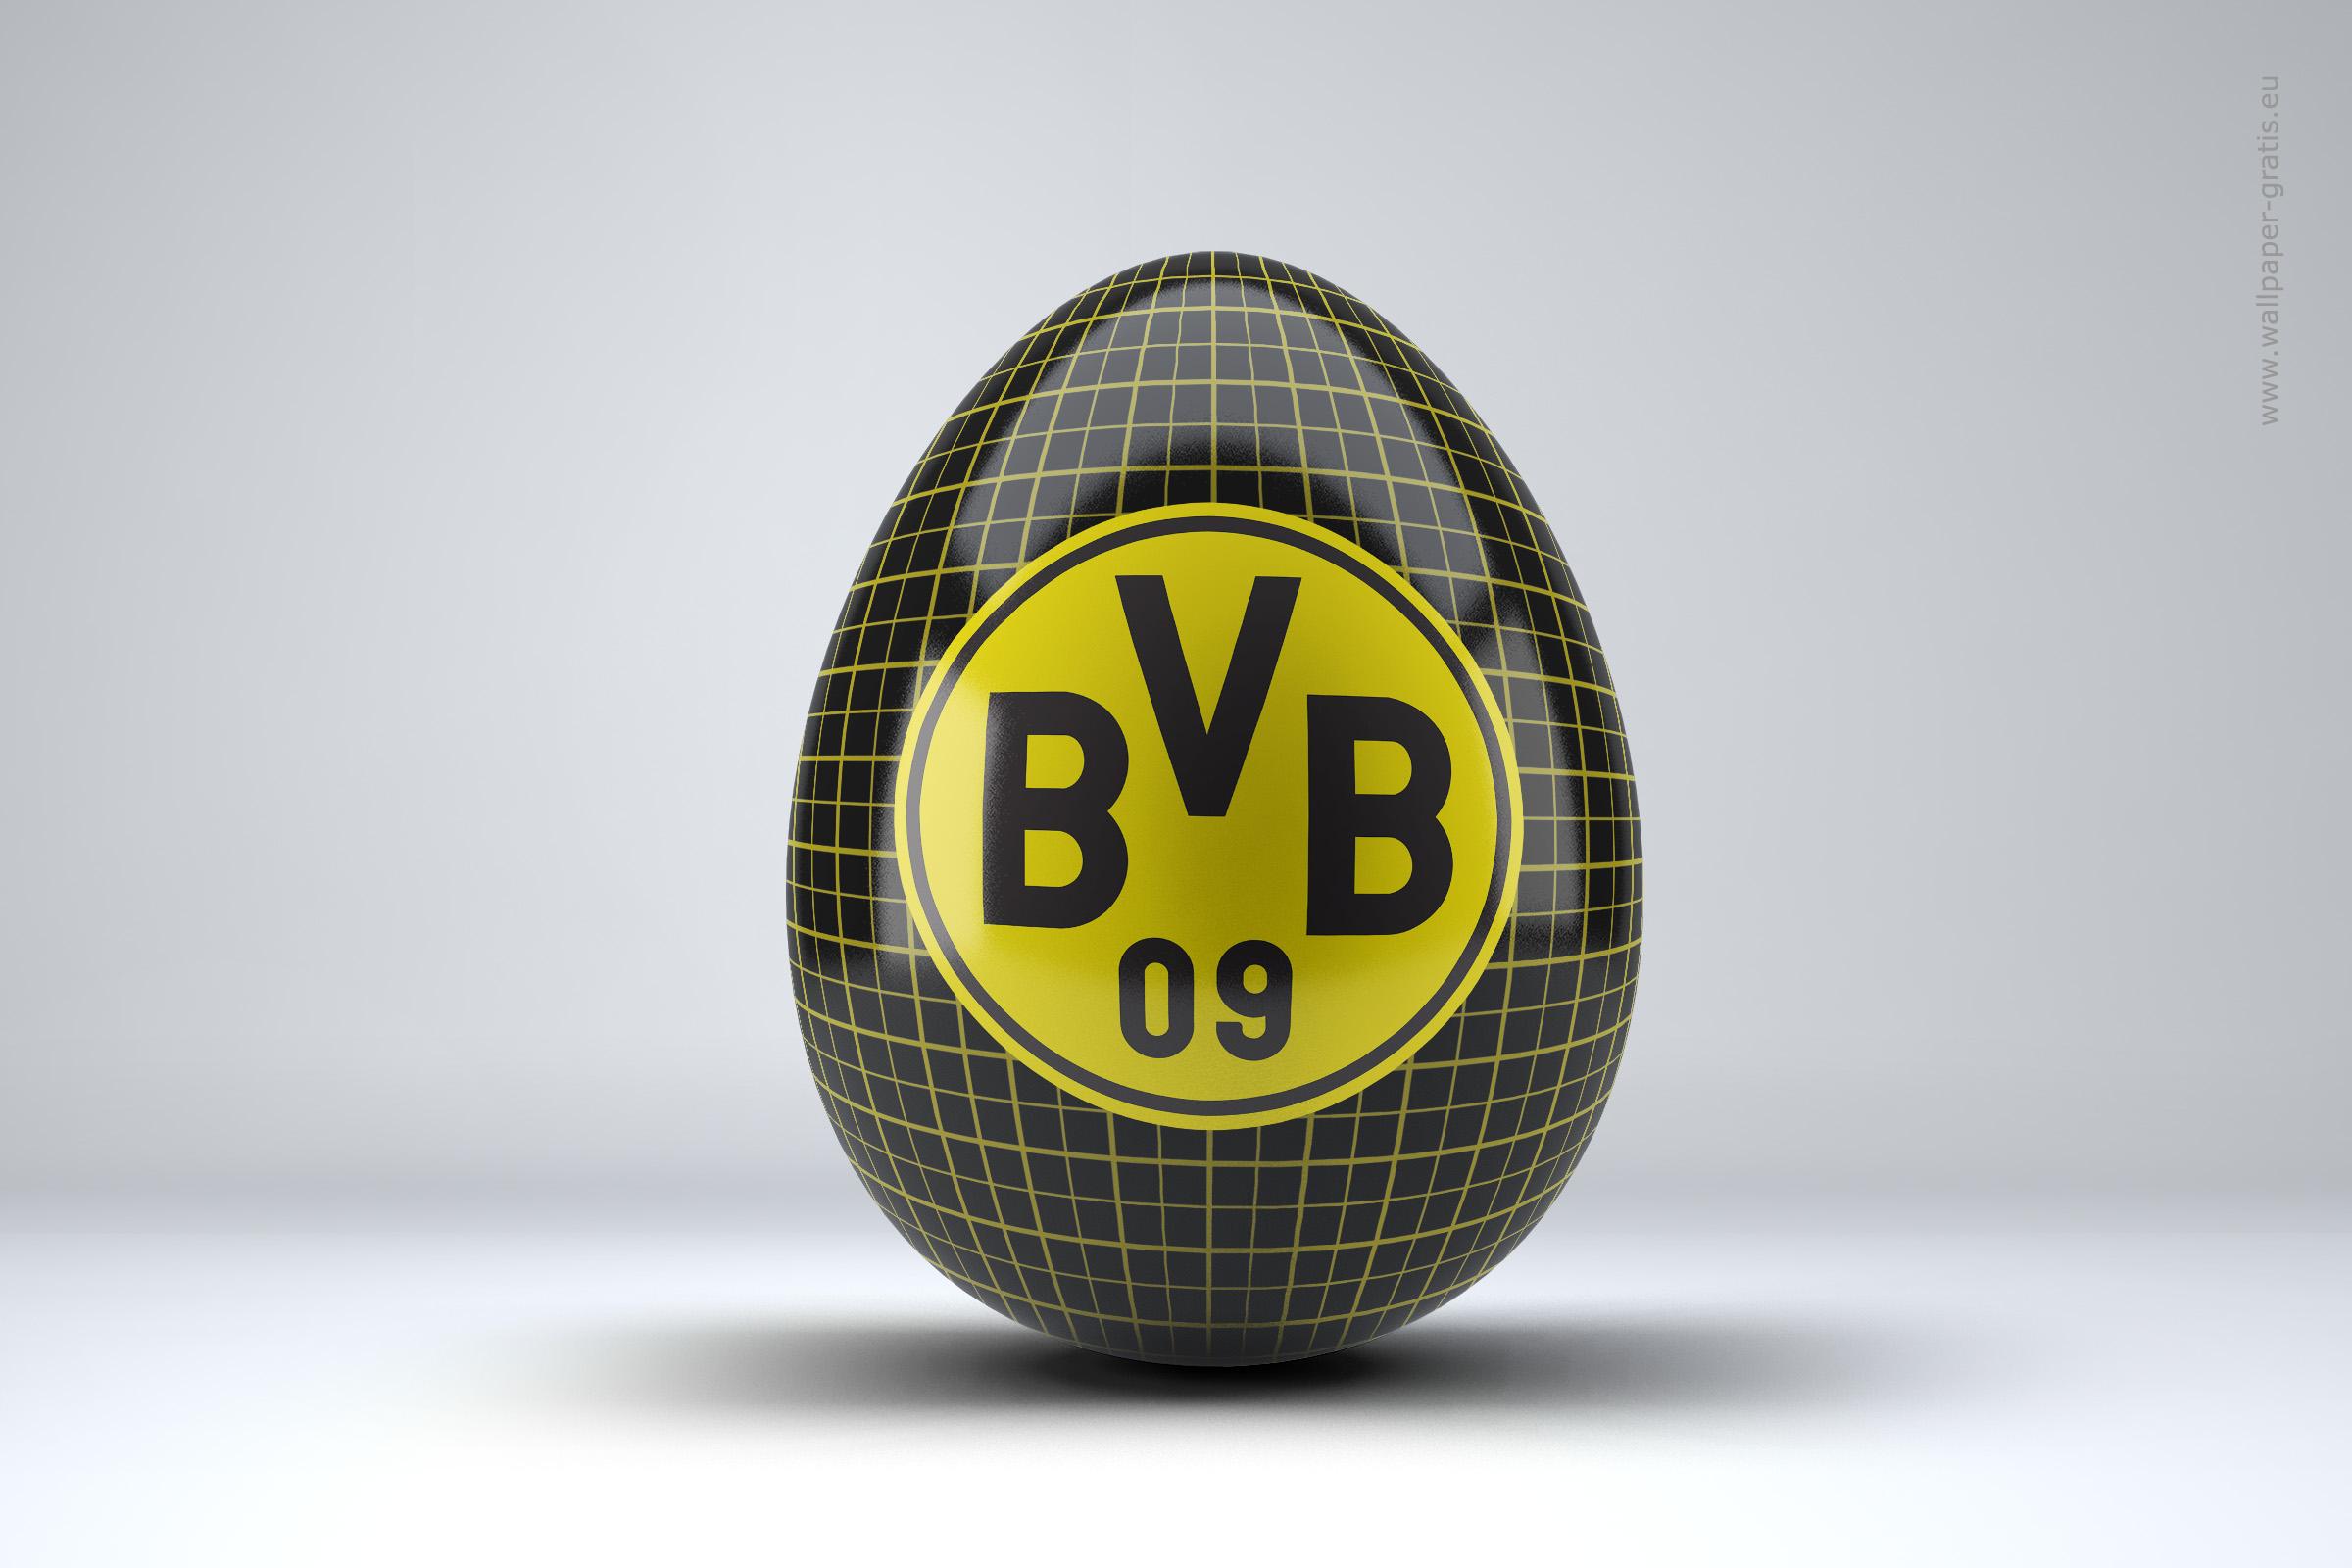 Bvb 09 Borussia Dortmund Bilder